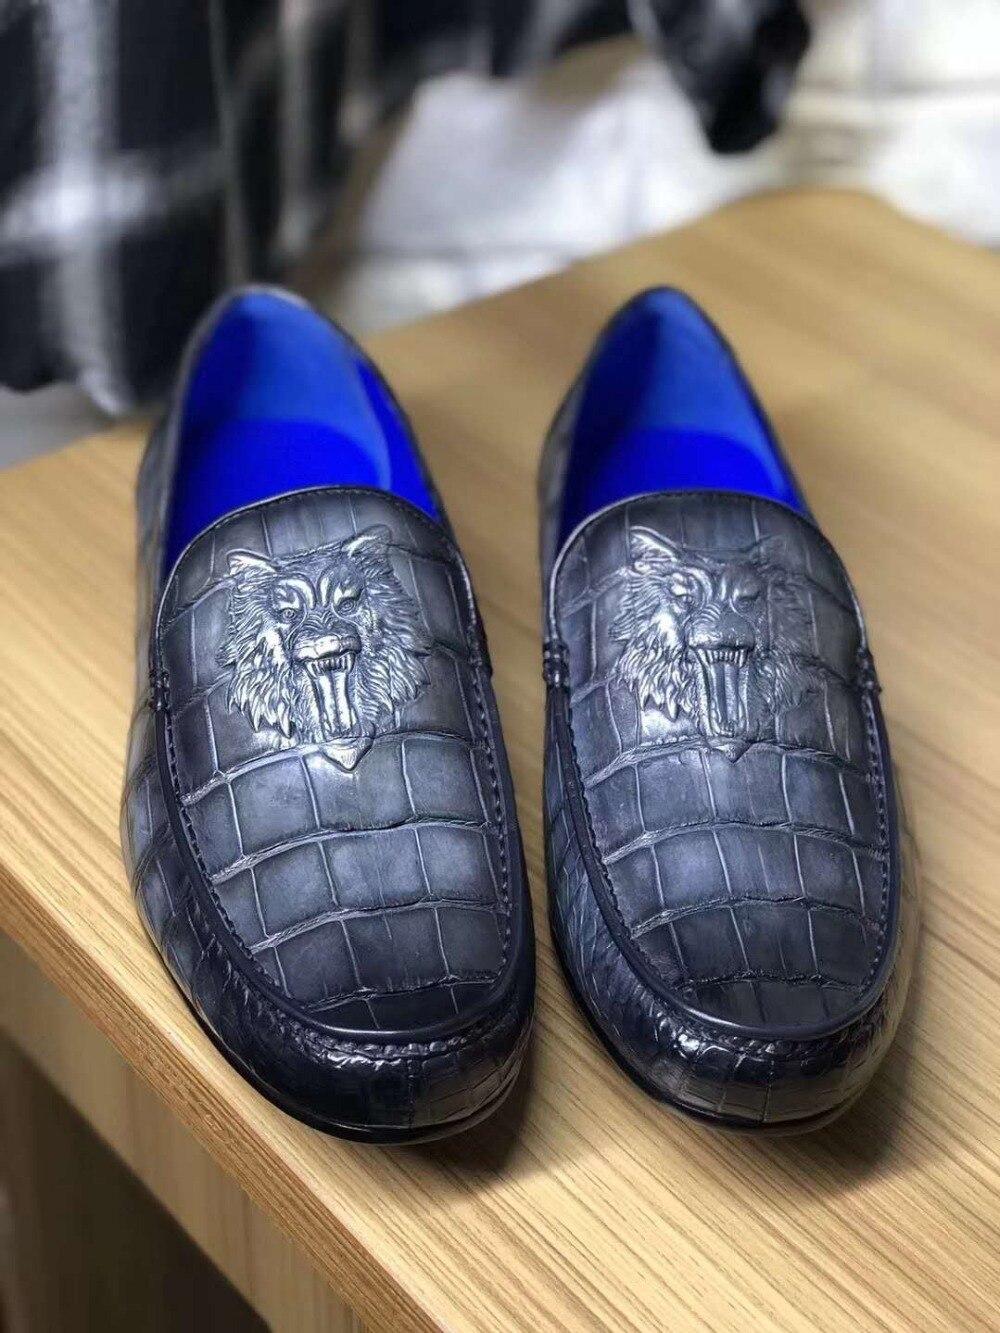 Formal Shoes 100% Genuine Real Crocodile Belly Skin Shinny Black Color Leather Men Shoe Durable Solid Crocodile Skin Men Dress Shoe Official Street Price